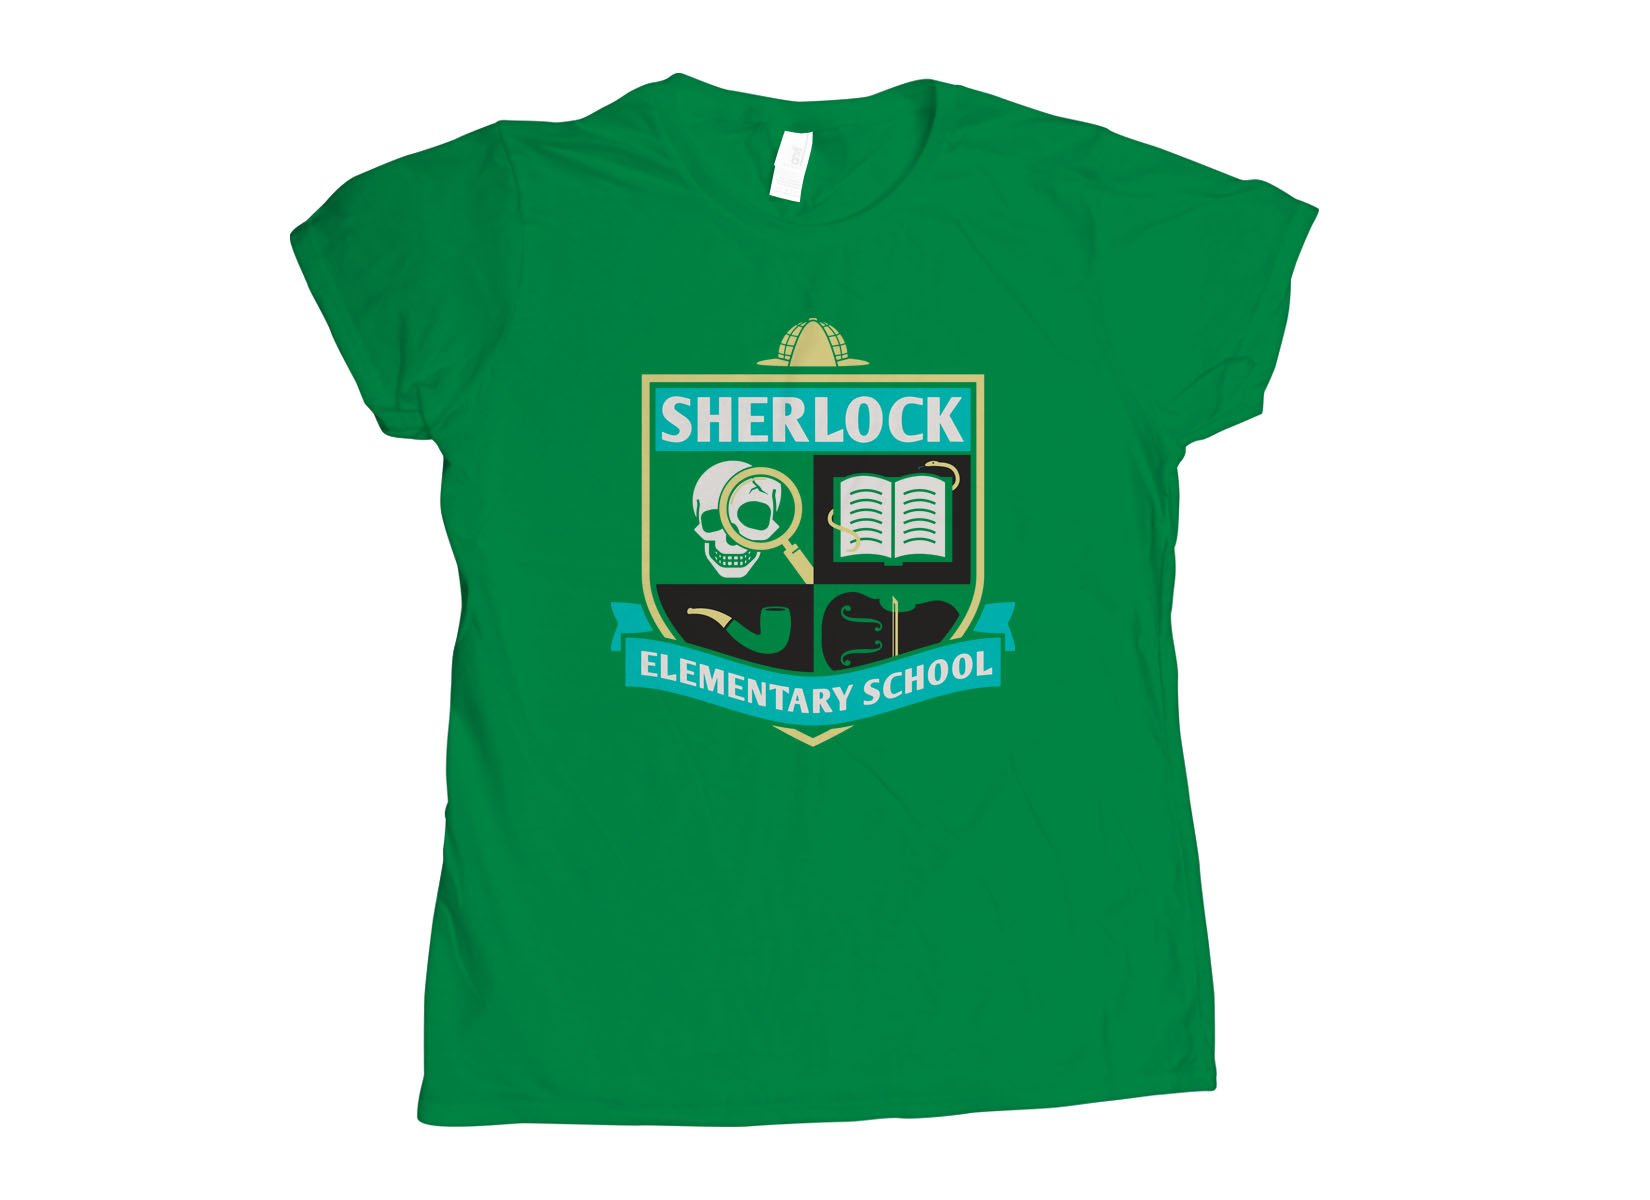 Sherlock Elementary School on Womens T-Shirt